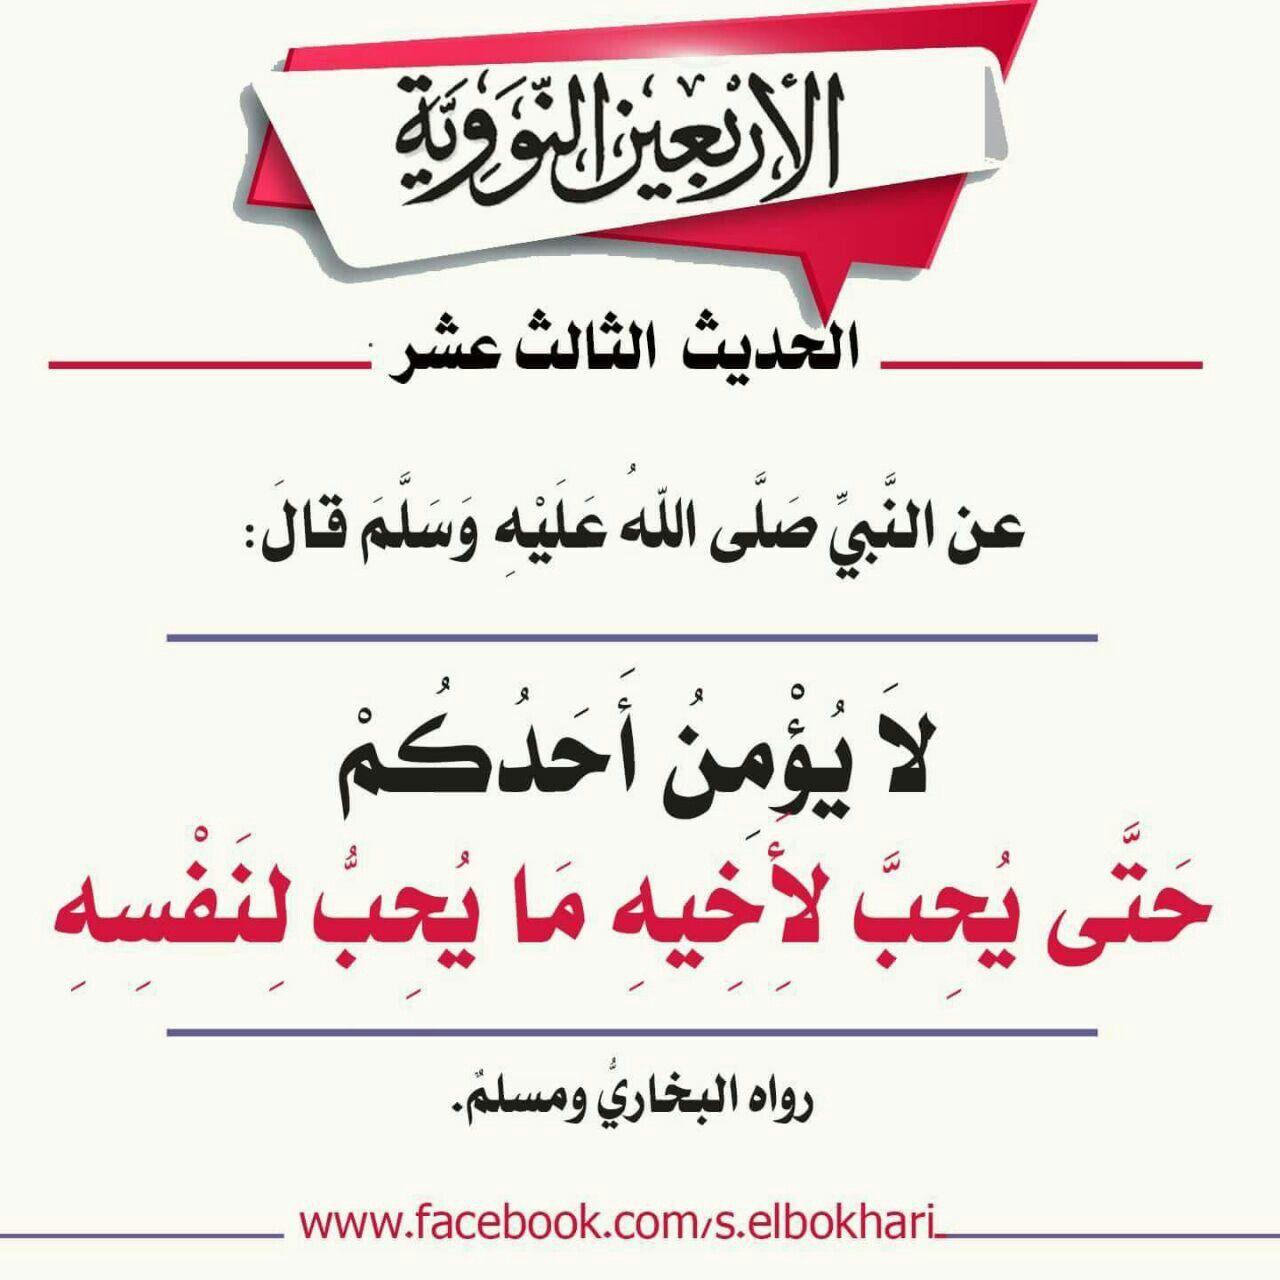 حديث شريف Arabic Calligraphy Dsi Calligraphy